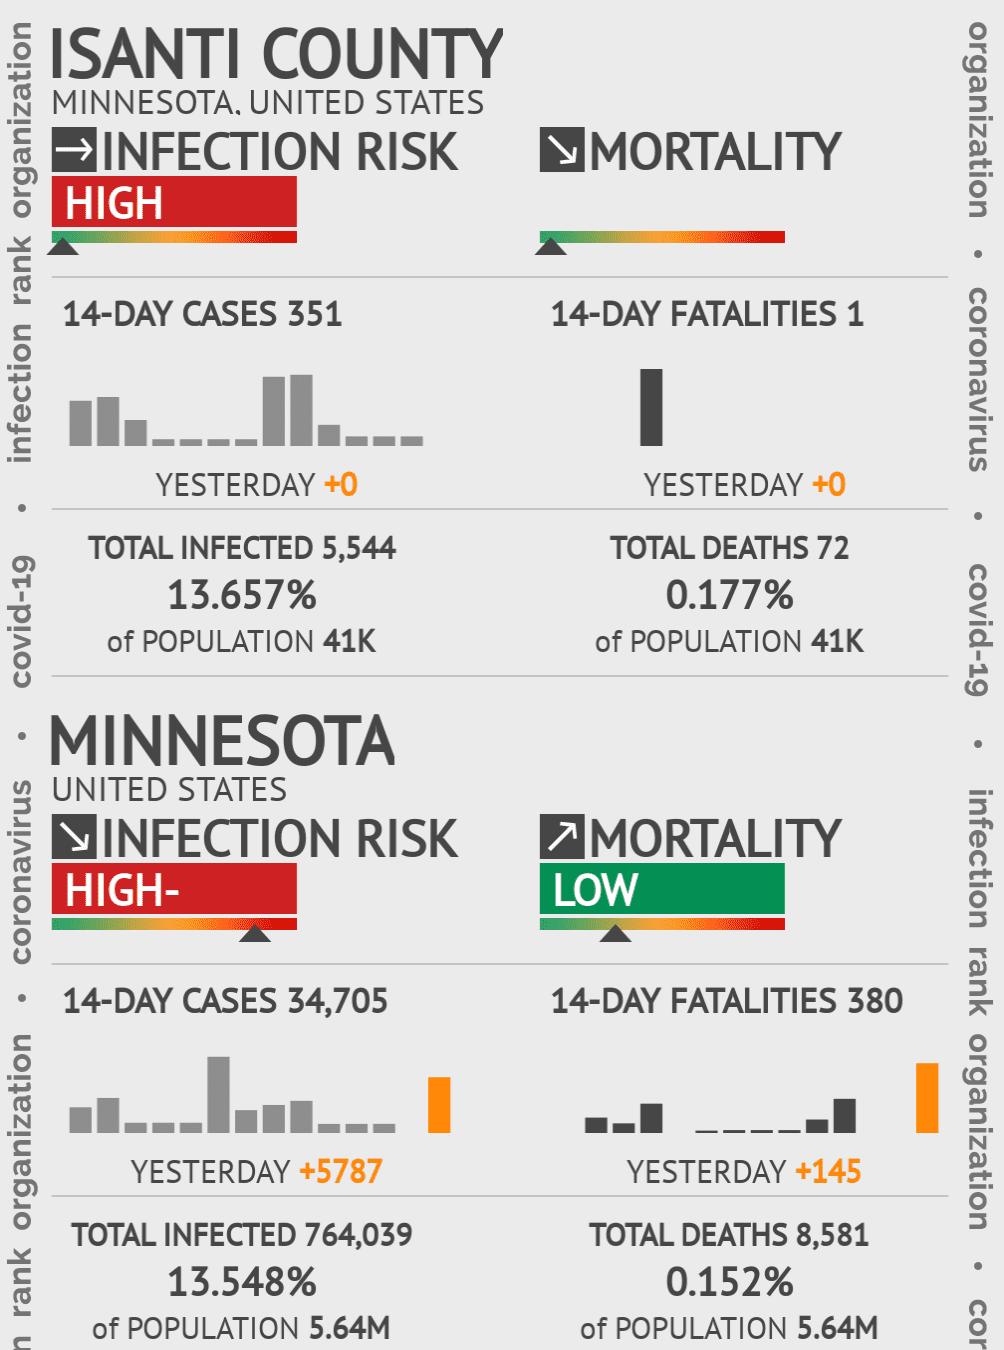 Isanti County Coronavirus Covid-19 Risk of Infection on July 24, 2021